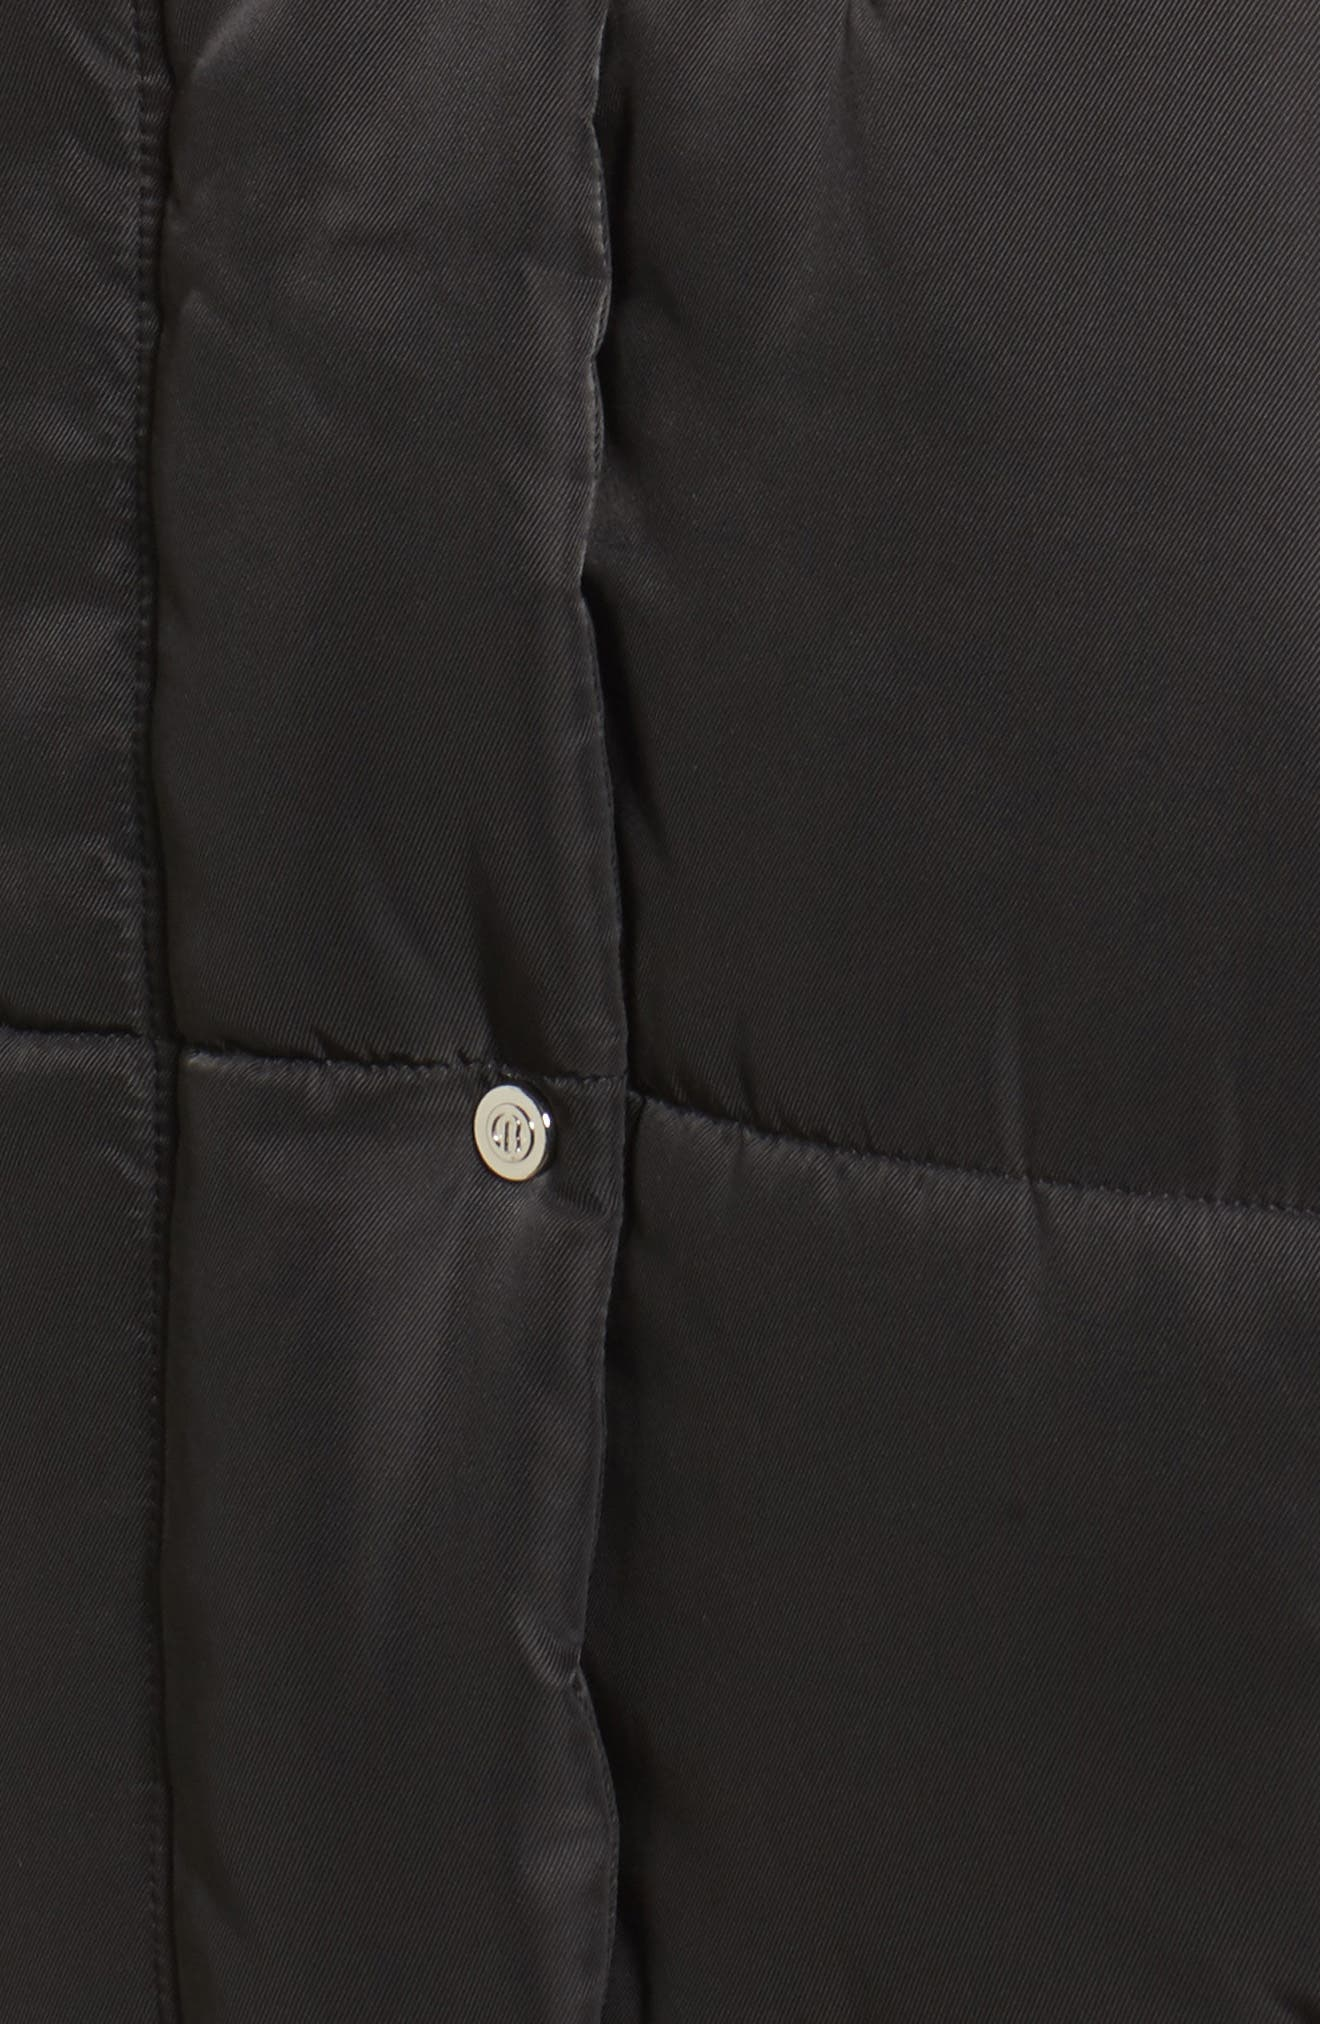 Oversize Puffer Jacket,                             Alternate thumbnail 5, color,                             Black